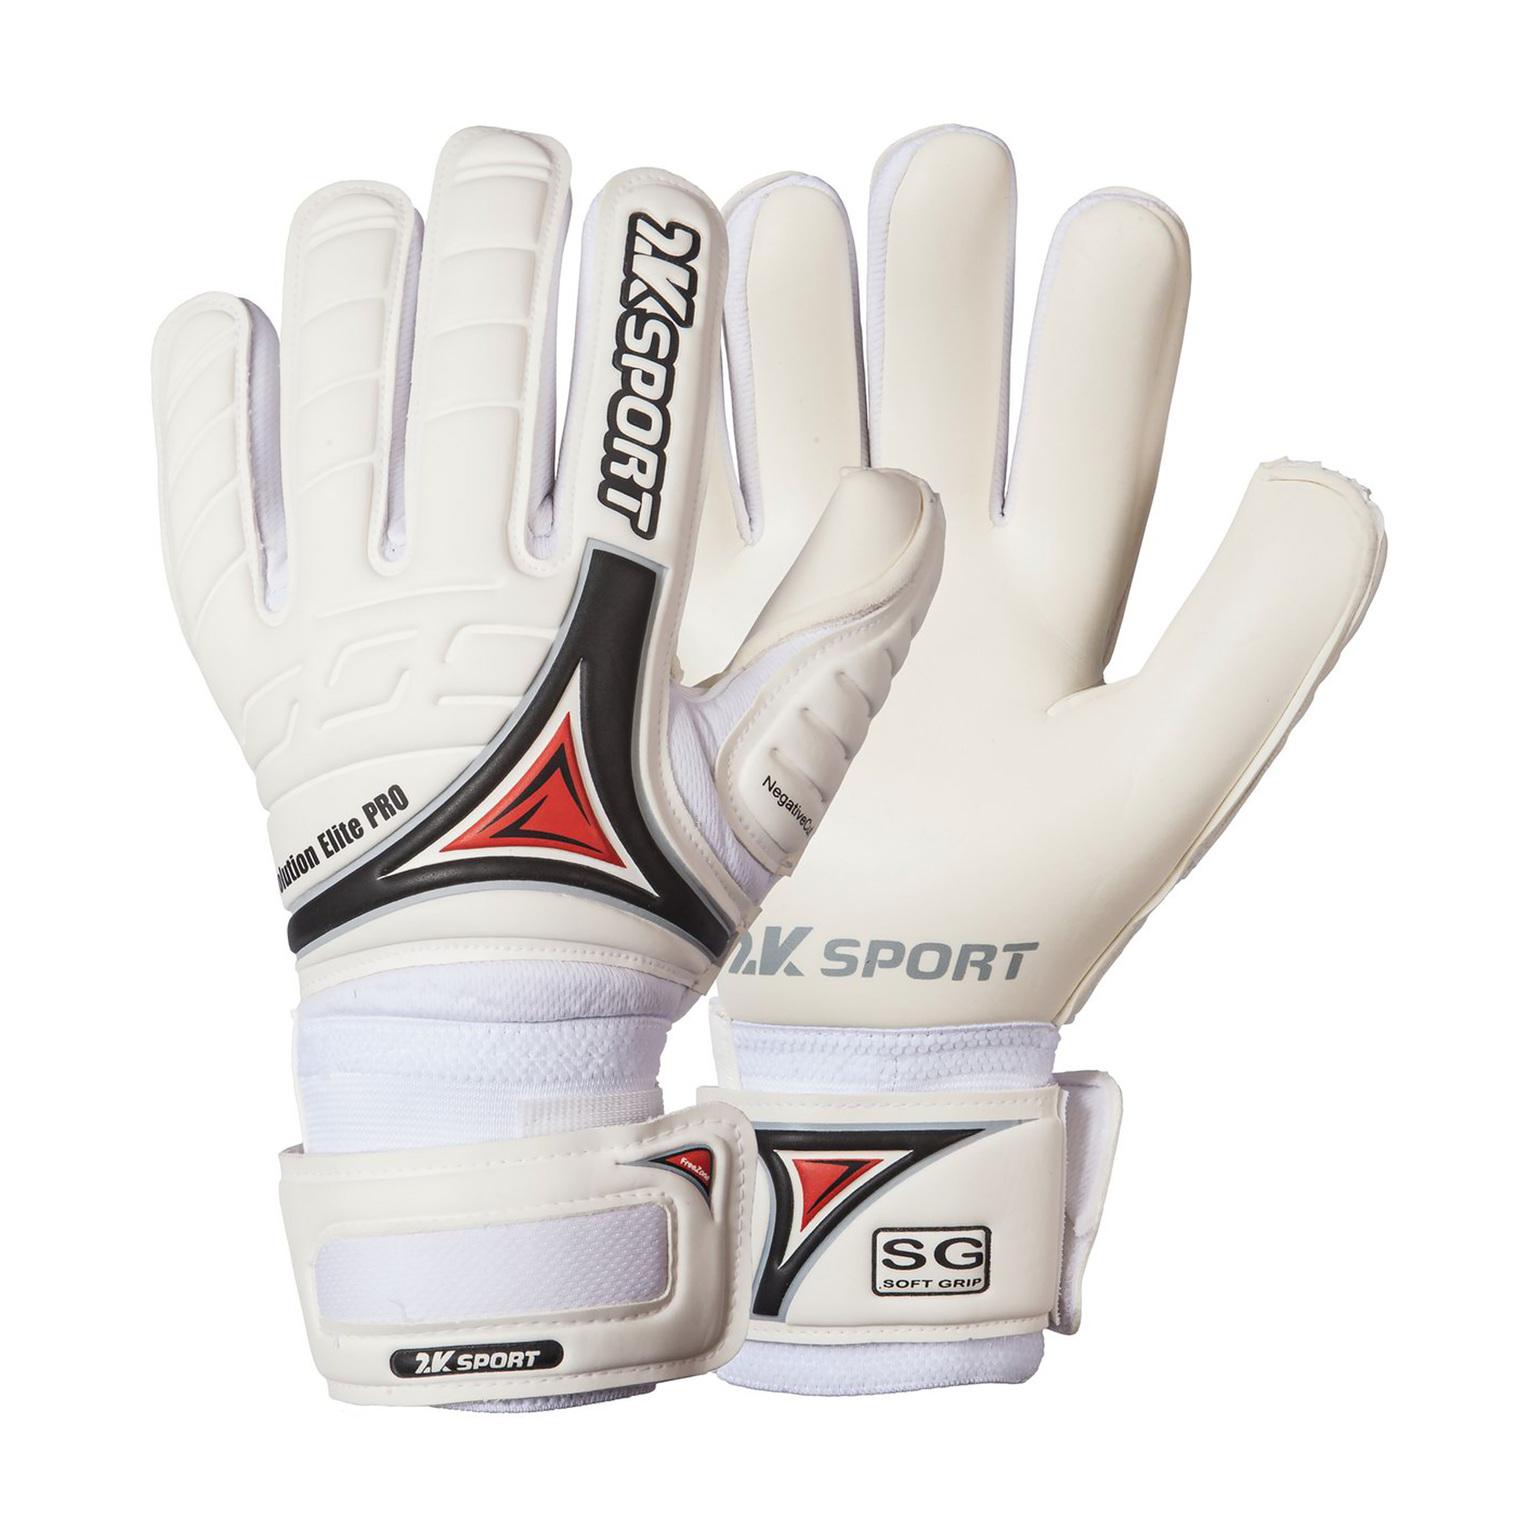 Перчатки вратарские 2K Sport Evolution Elite Pro 124917 500pcs 1210 1 2k 1k2 1 2k ohm 5